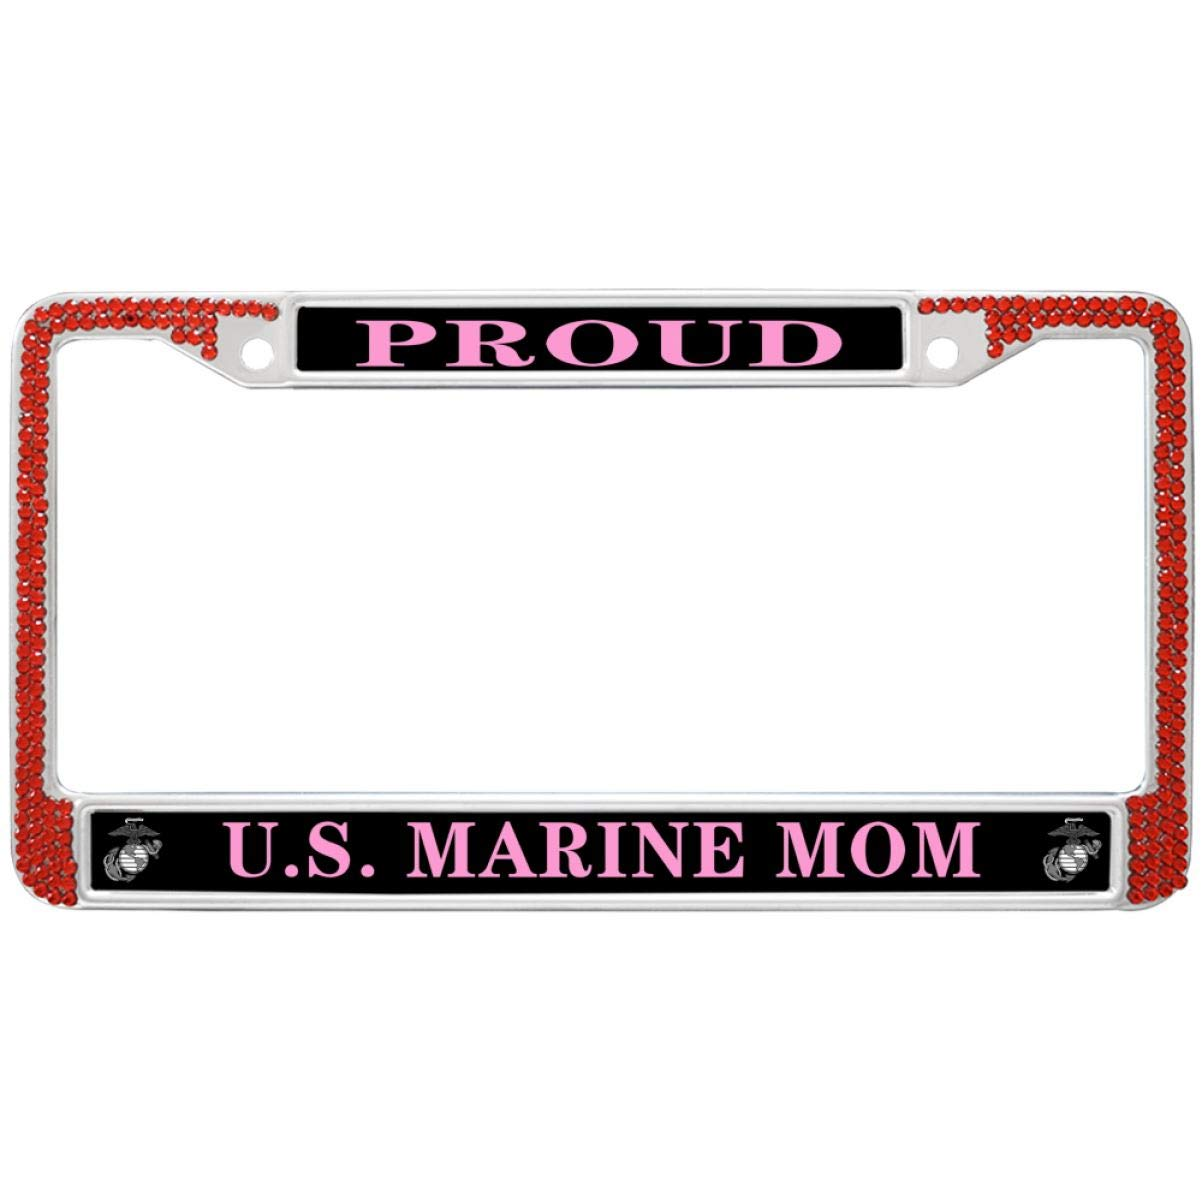 Proud US Marine MOM License Plate Frame